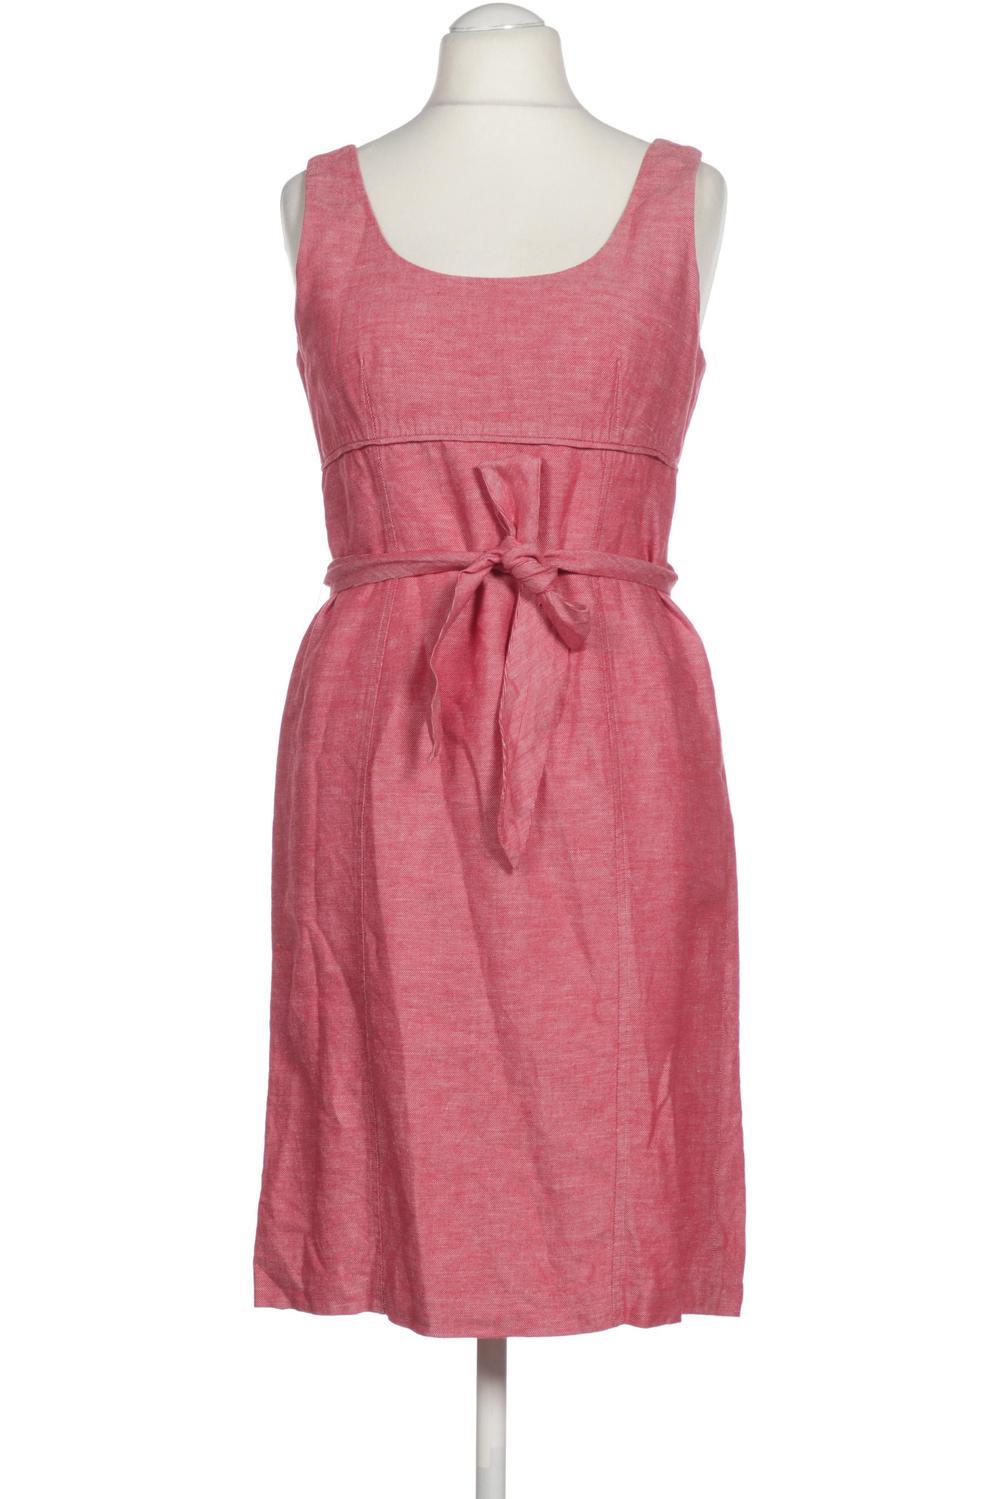 Savannah Kleid Damen Dress Damenkleid Gr. DE 40 Baumwolle ...